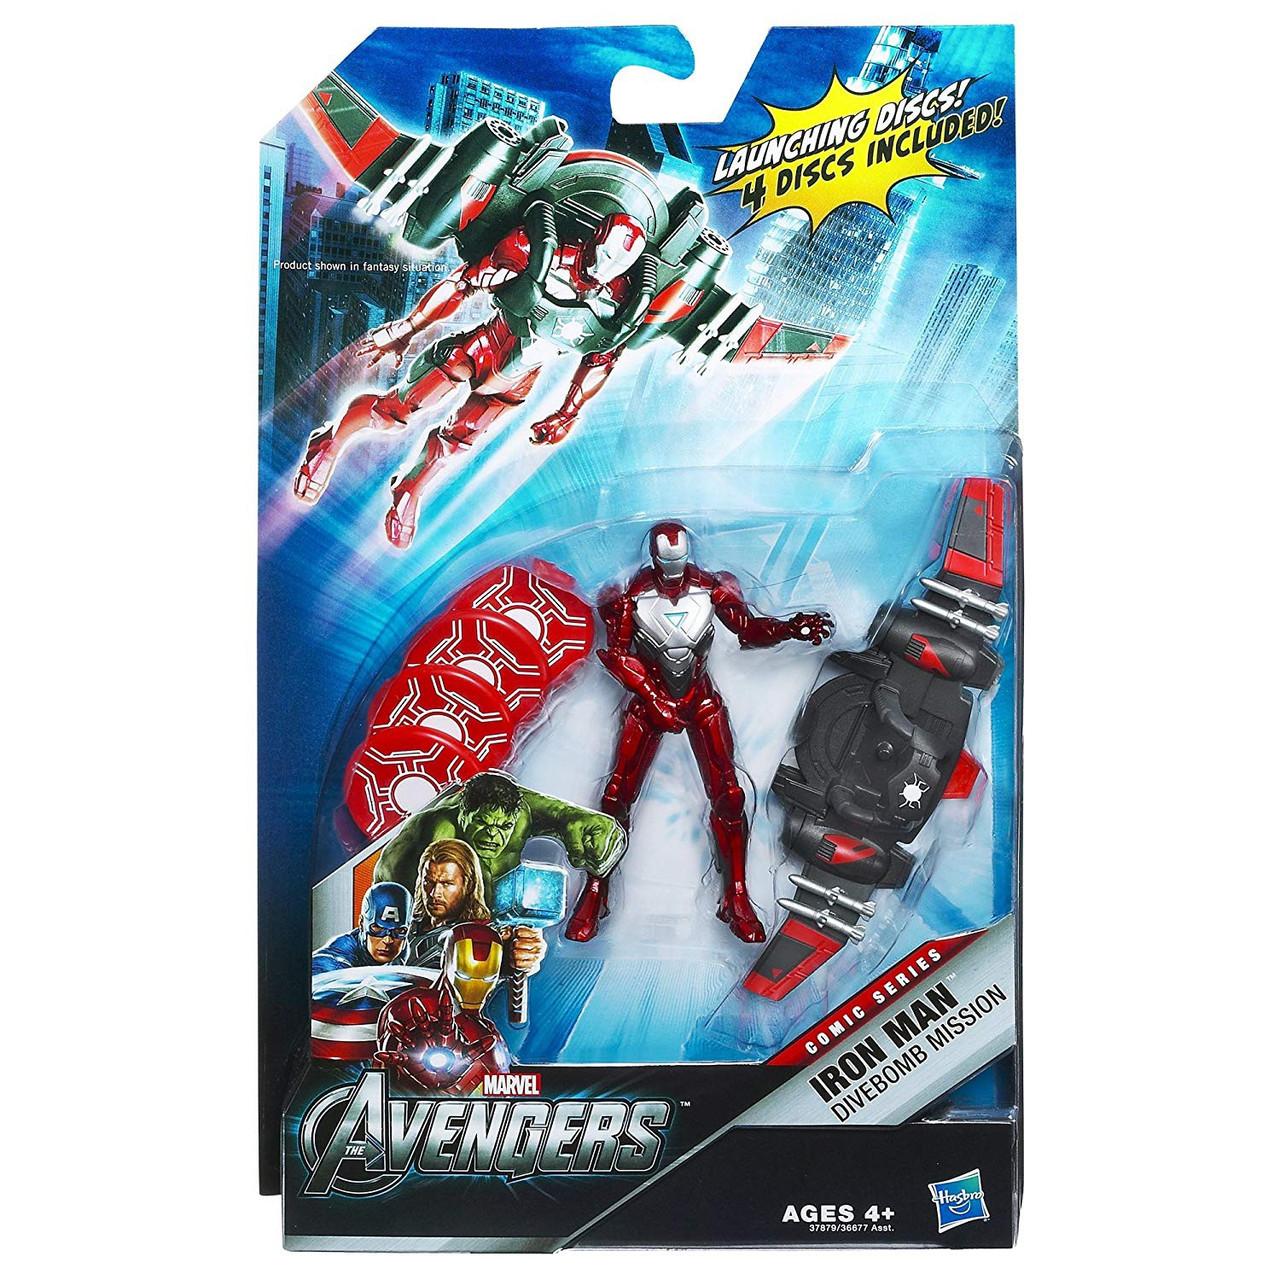 Marvel Avengers Comic Series Divebomb Mission Iron Man Action Figure